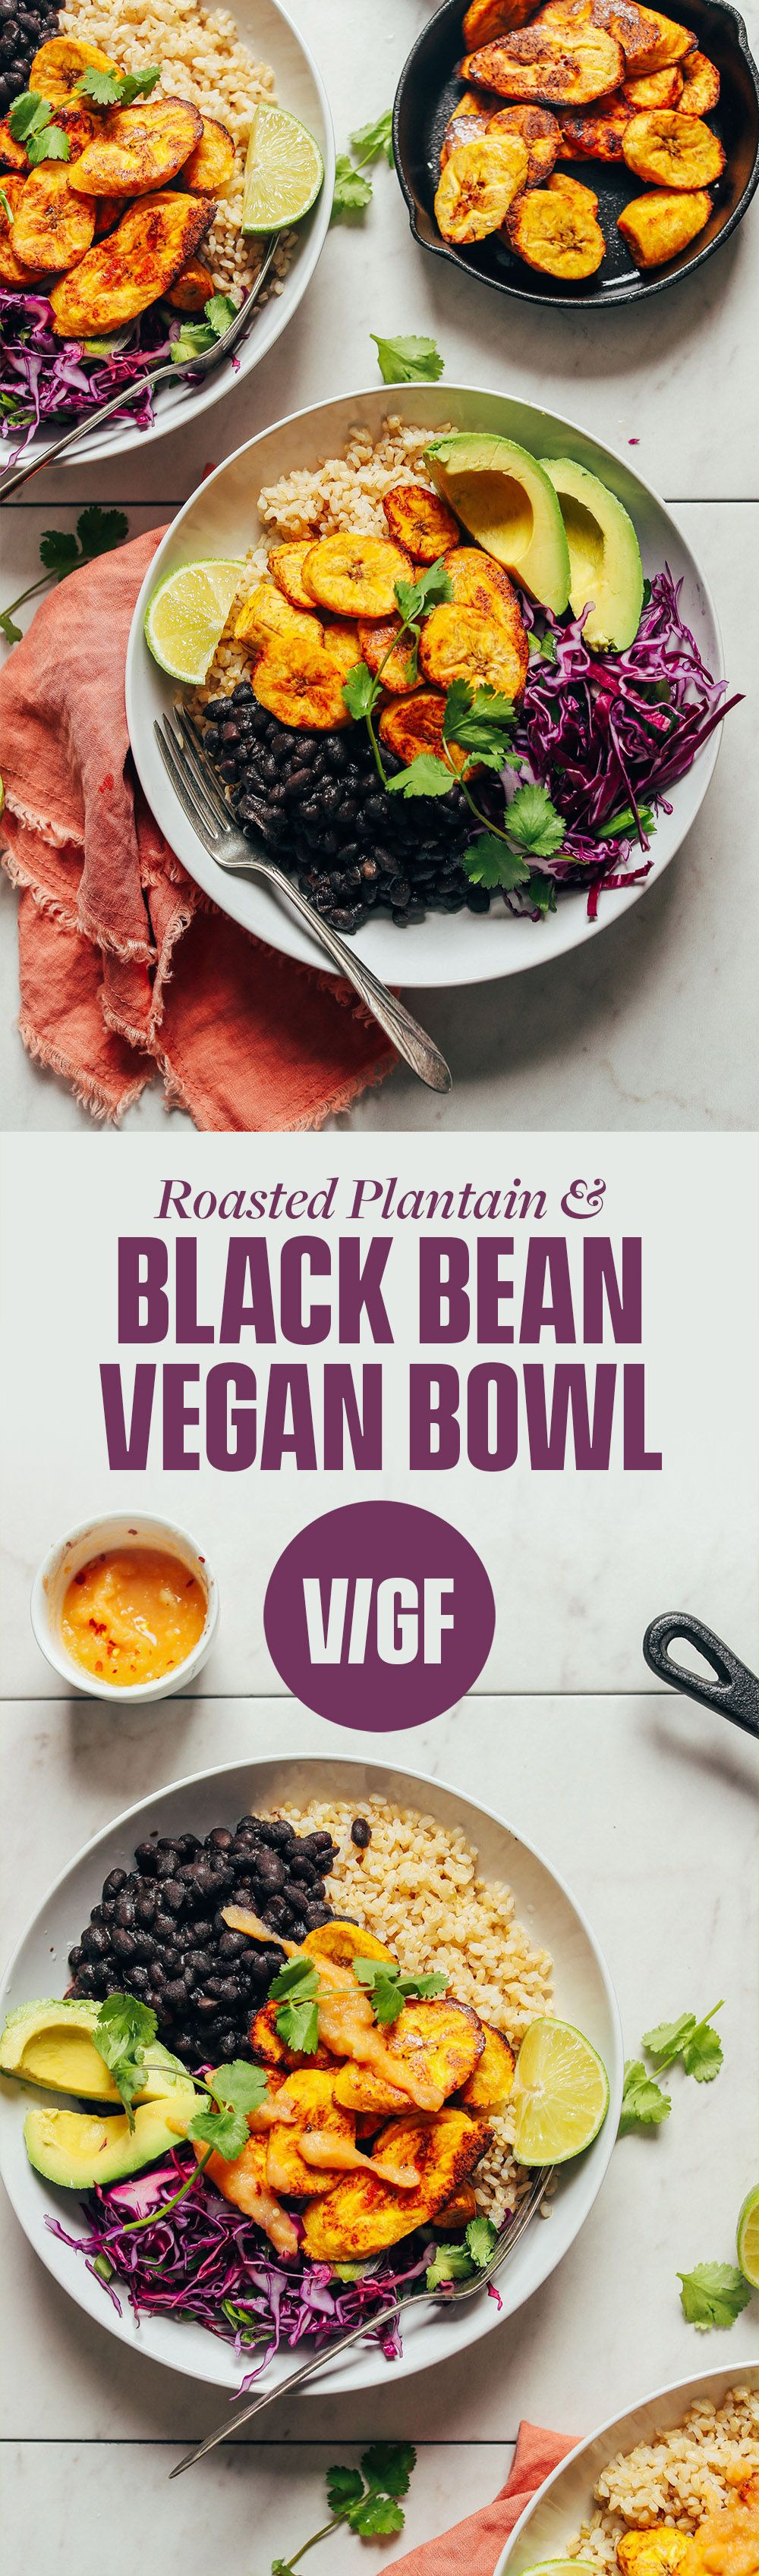 Black Bean Plantain Vegan Bowl